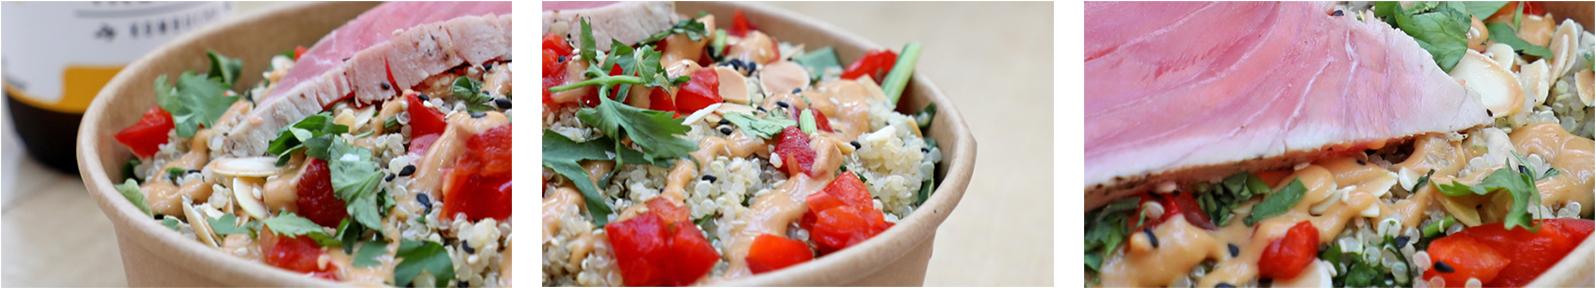 menu-grain-bowls